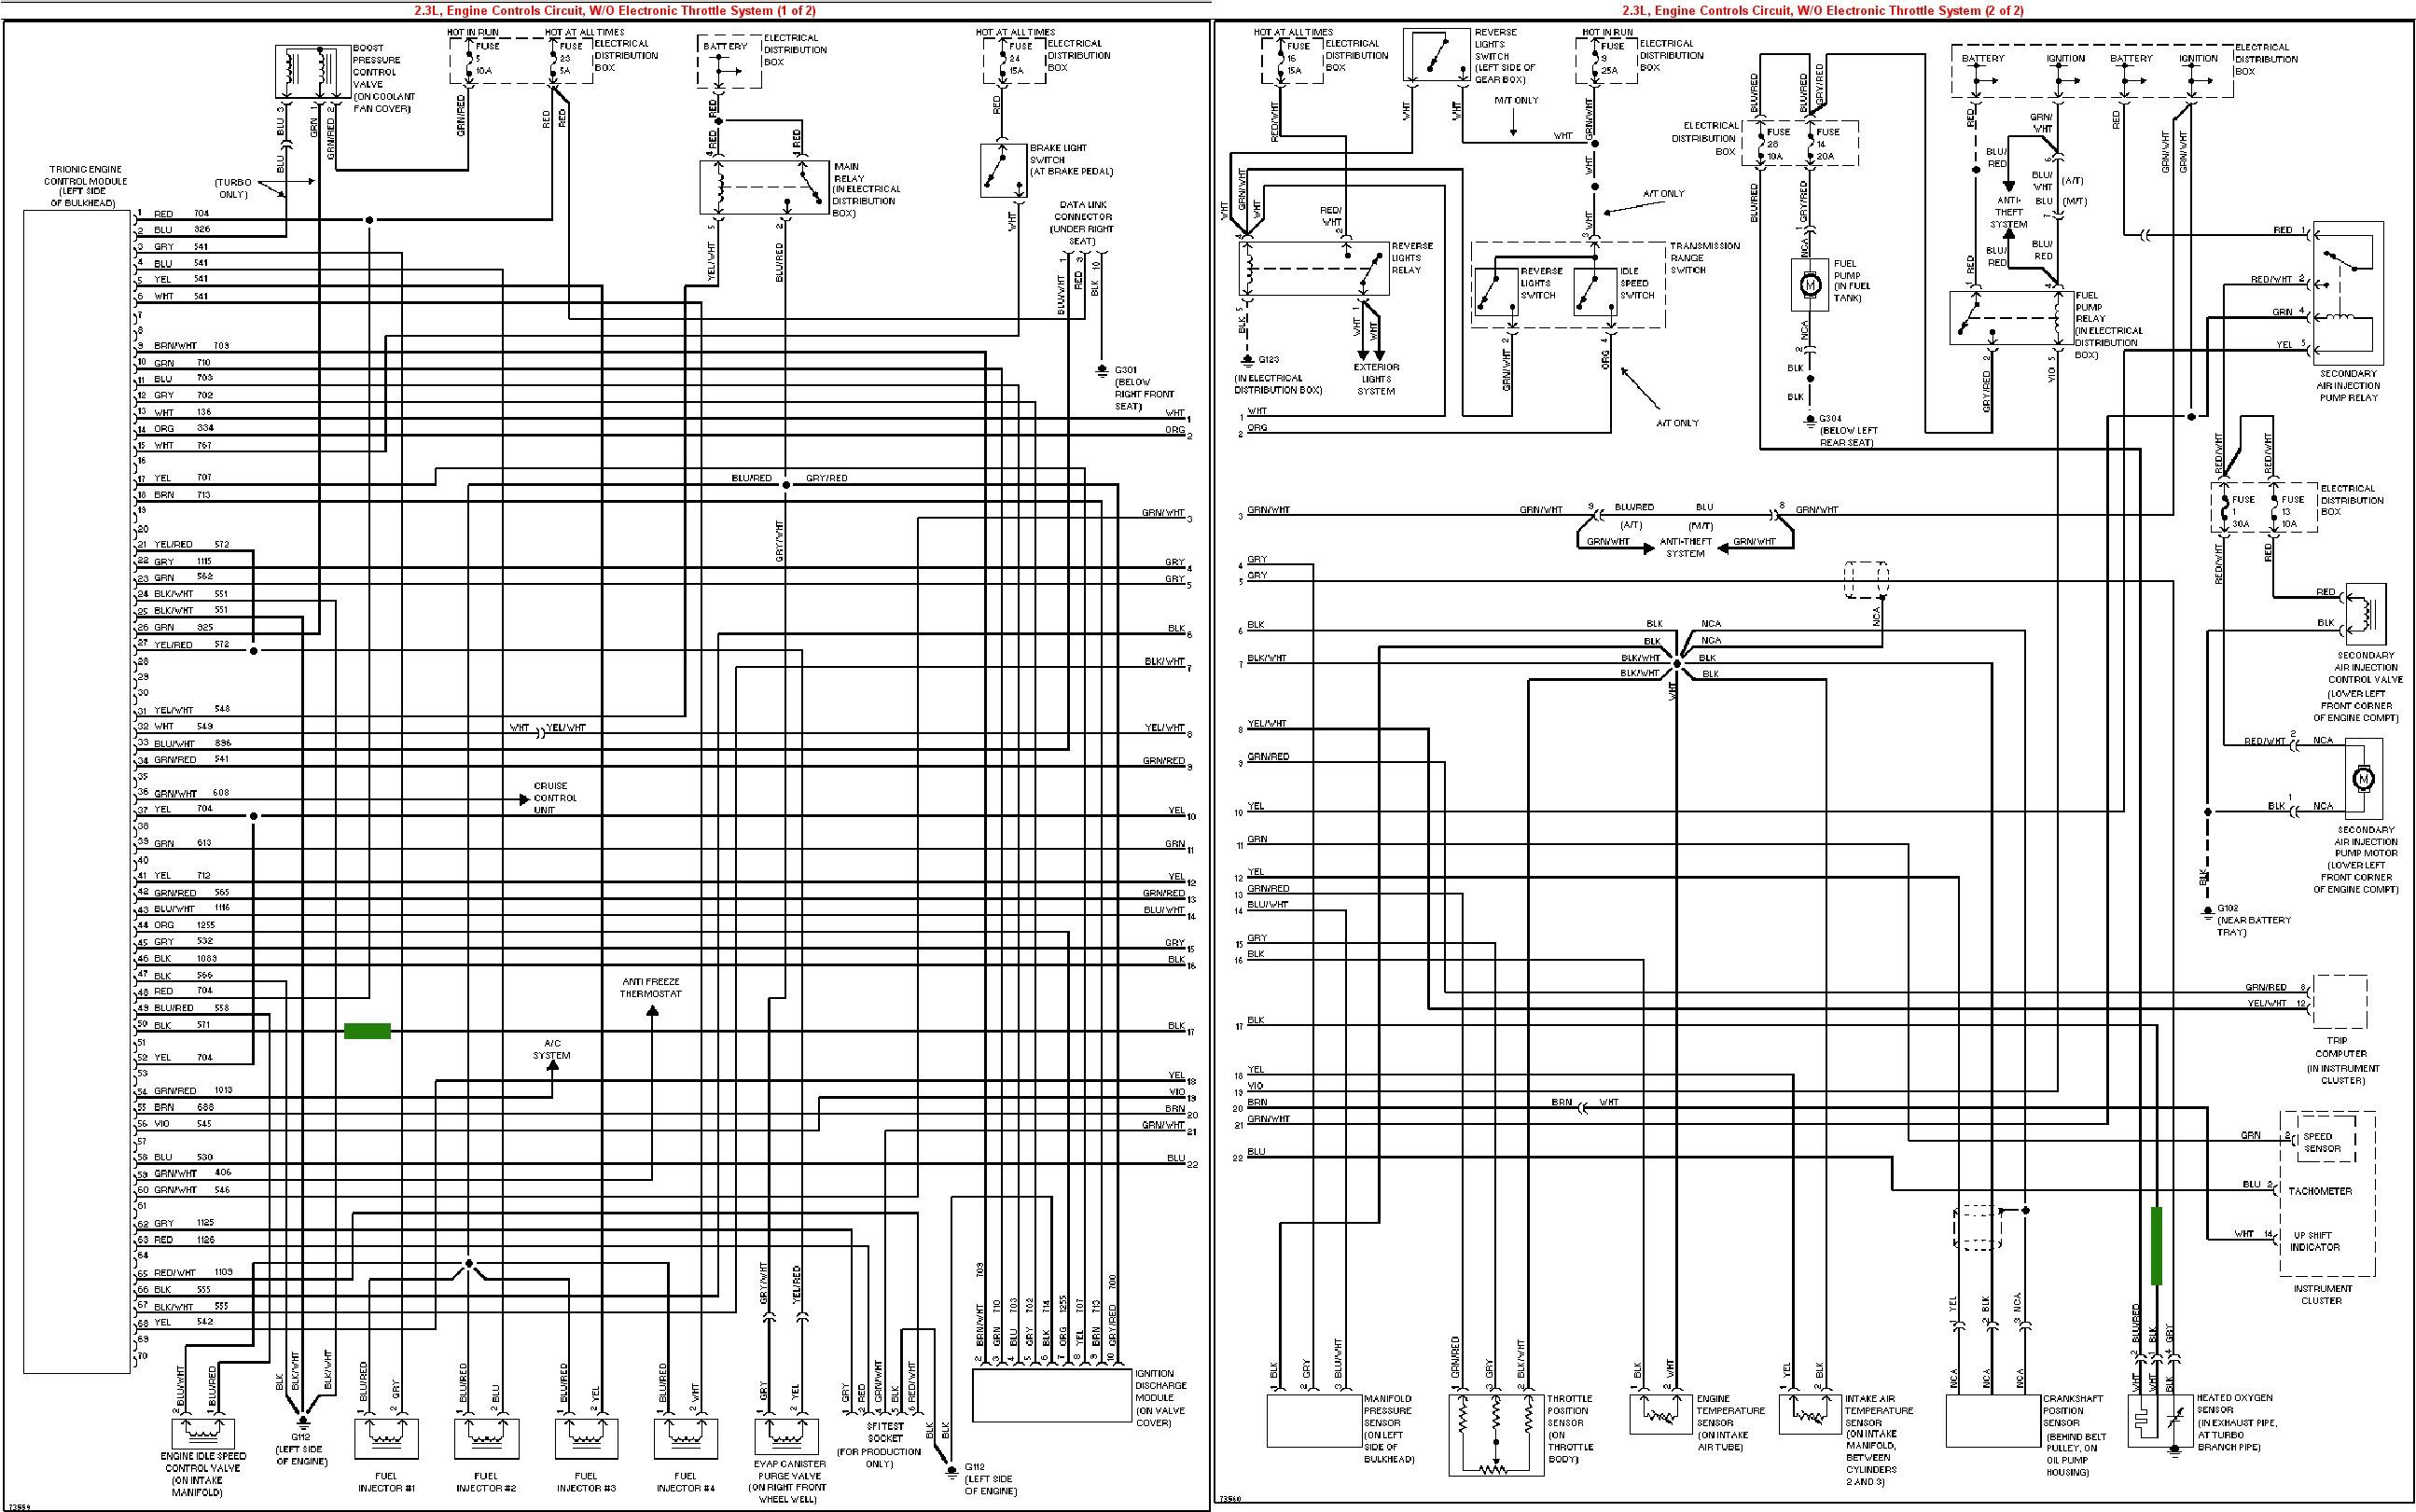 Saab 93 Stereo Wiring 695 1999 Jeep Dash Light Wiring Diagram Of Saab 93 Stereo Wiring